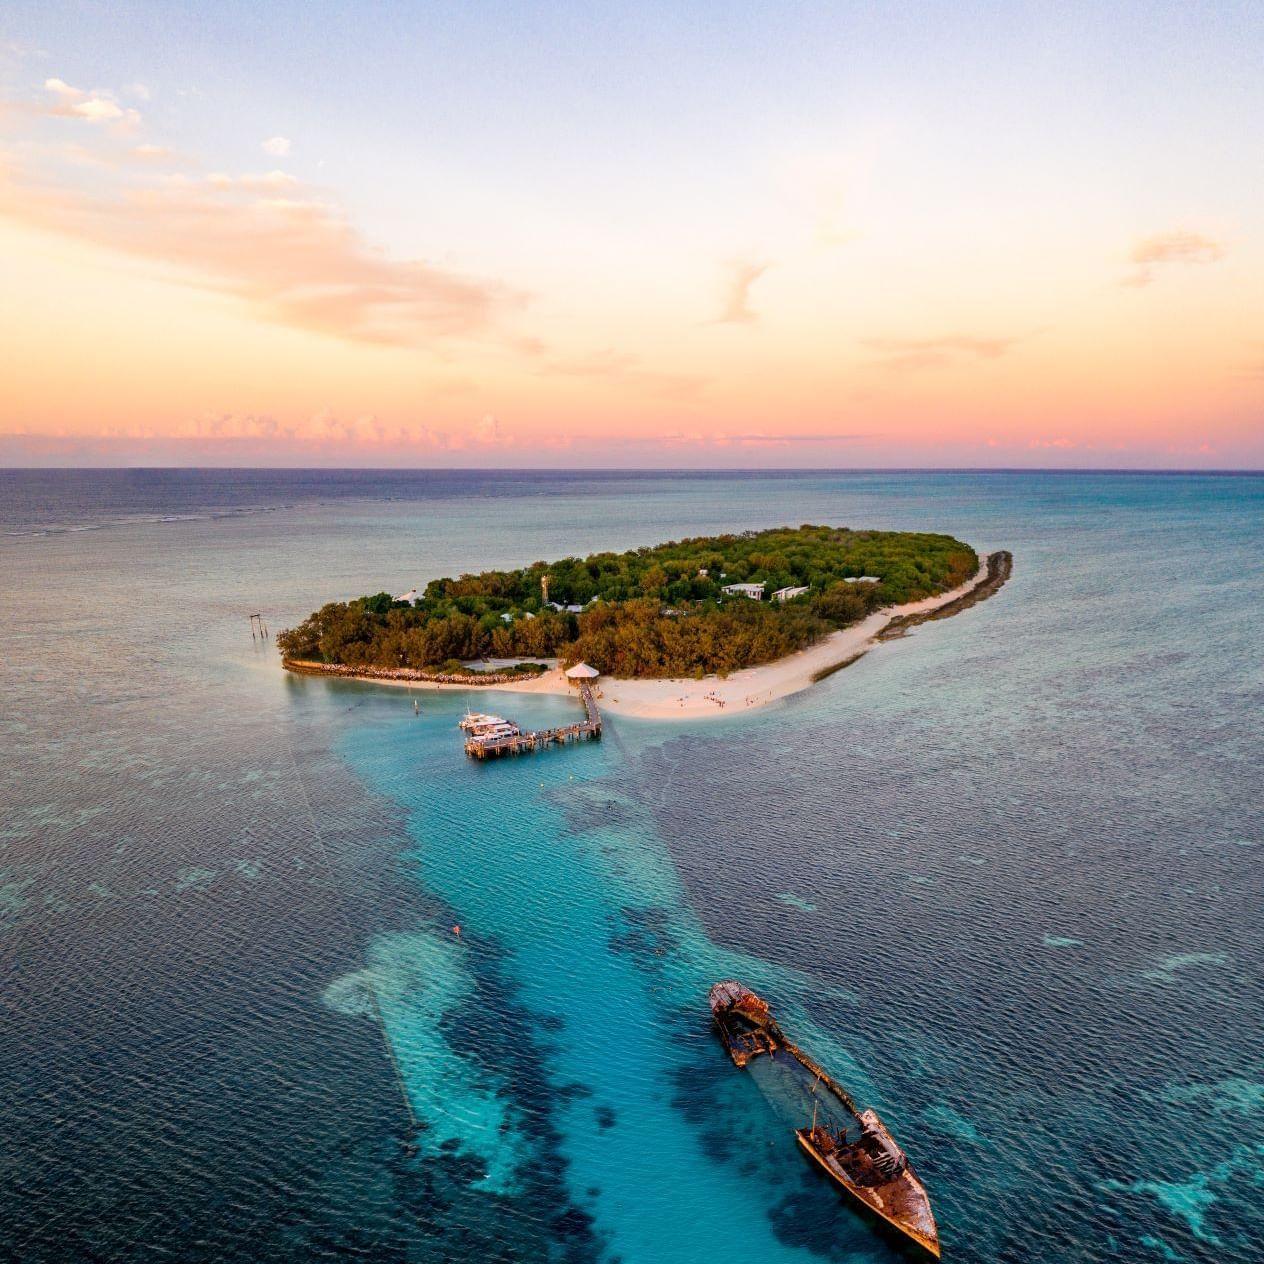 Heron Island has Reopened COVIDSafe